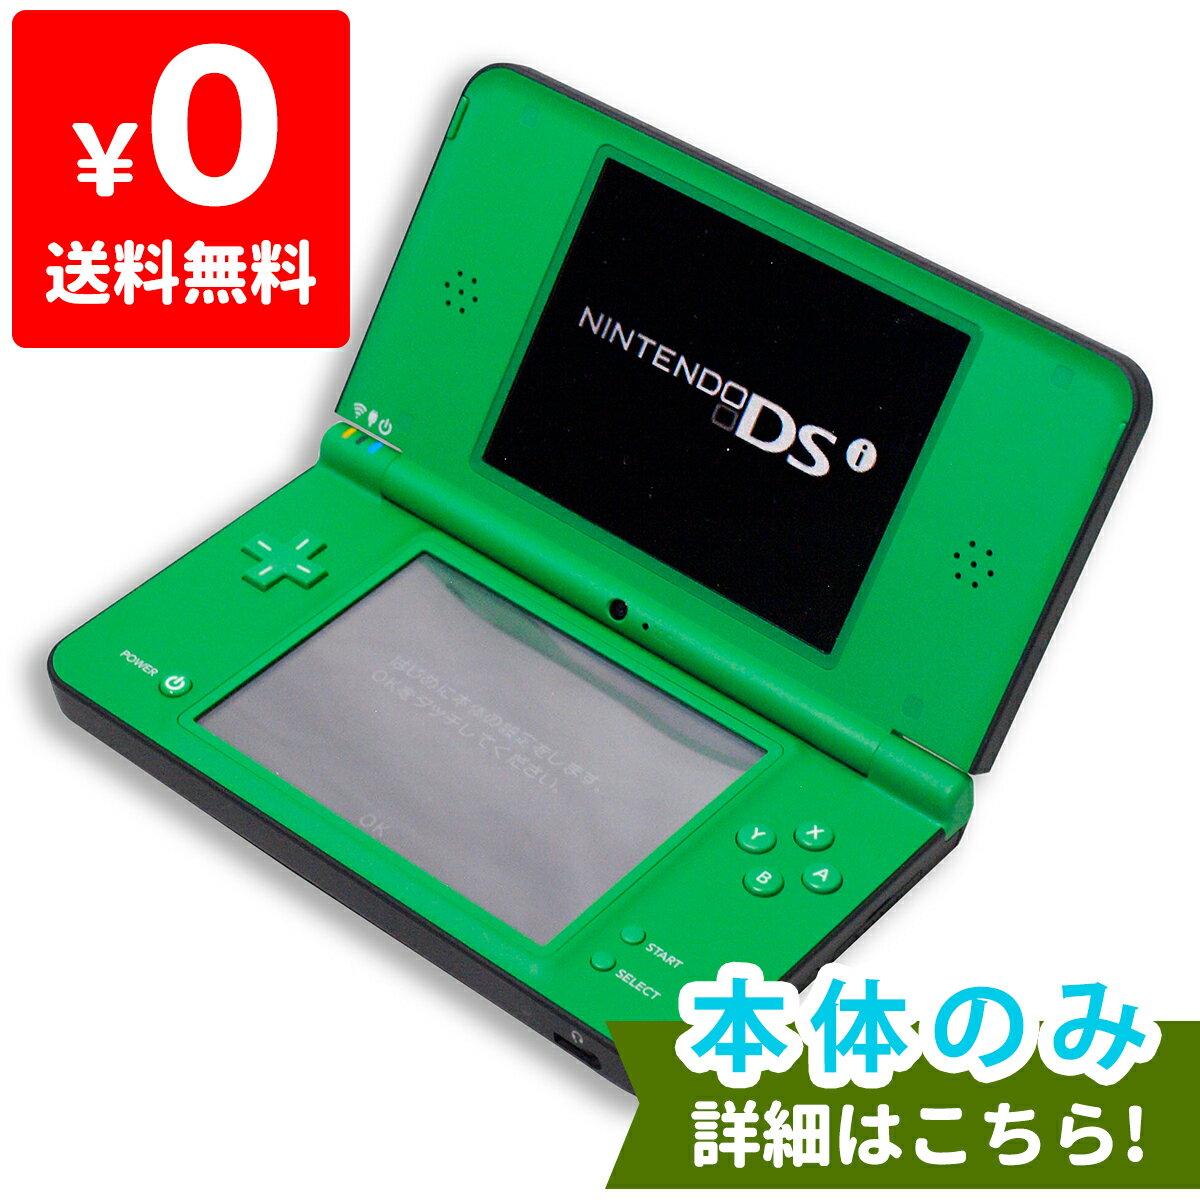 DSiLL ニンテンドーDSi LL グリーンUTL-S-MKA 本体のみ タッチペン付き Nintendo 任天堂 ニンテンドー 中古 4902370518221 送料無料 【中古】